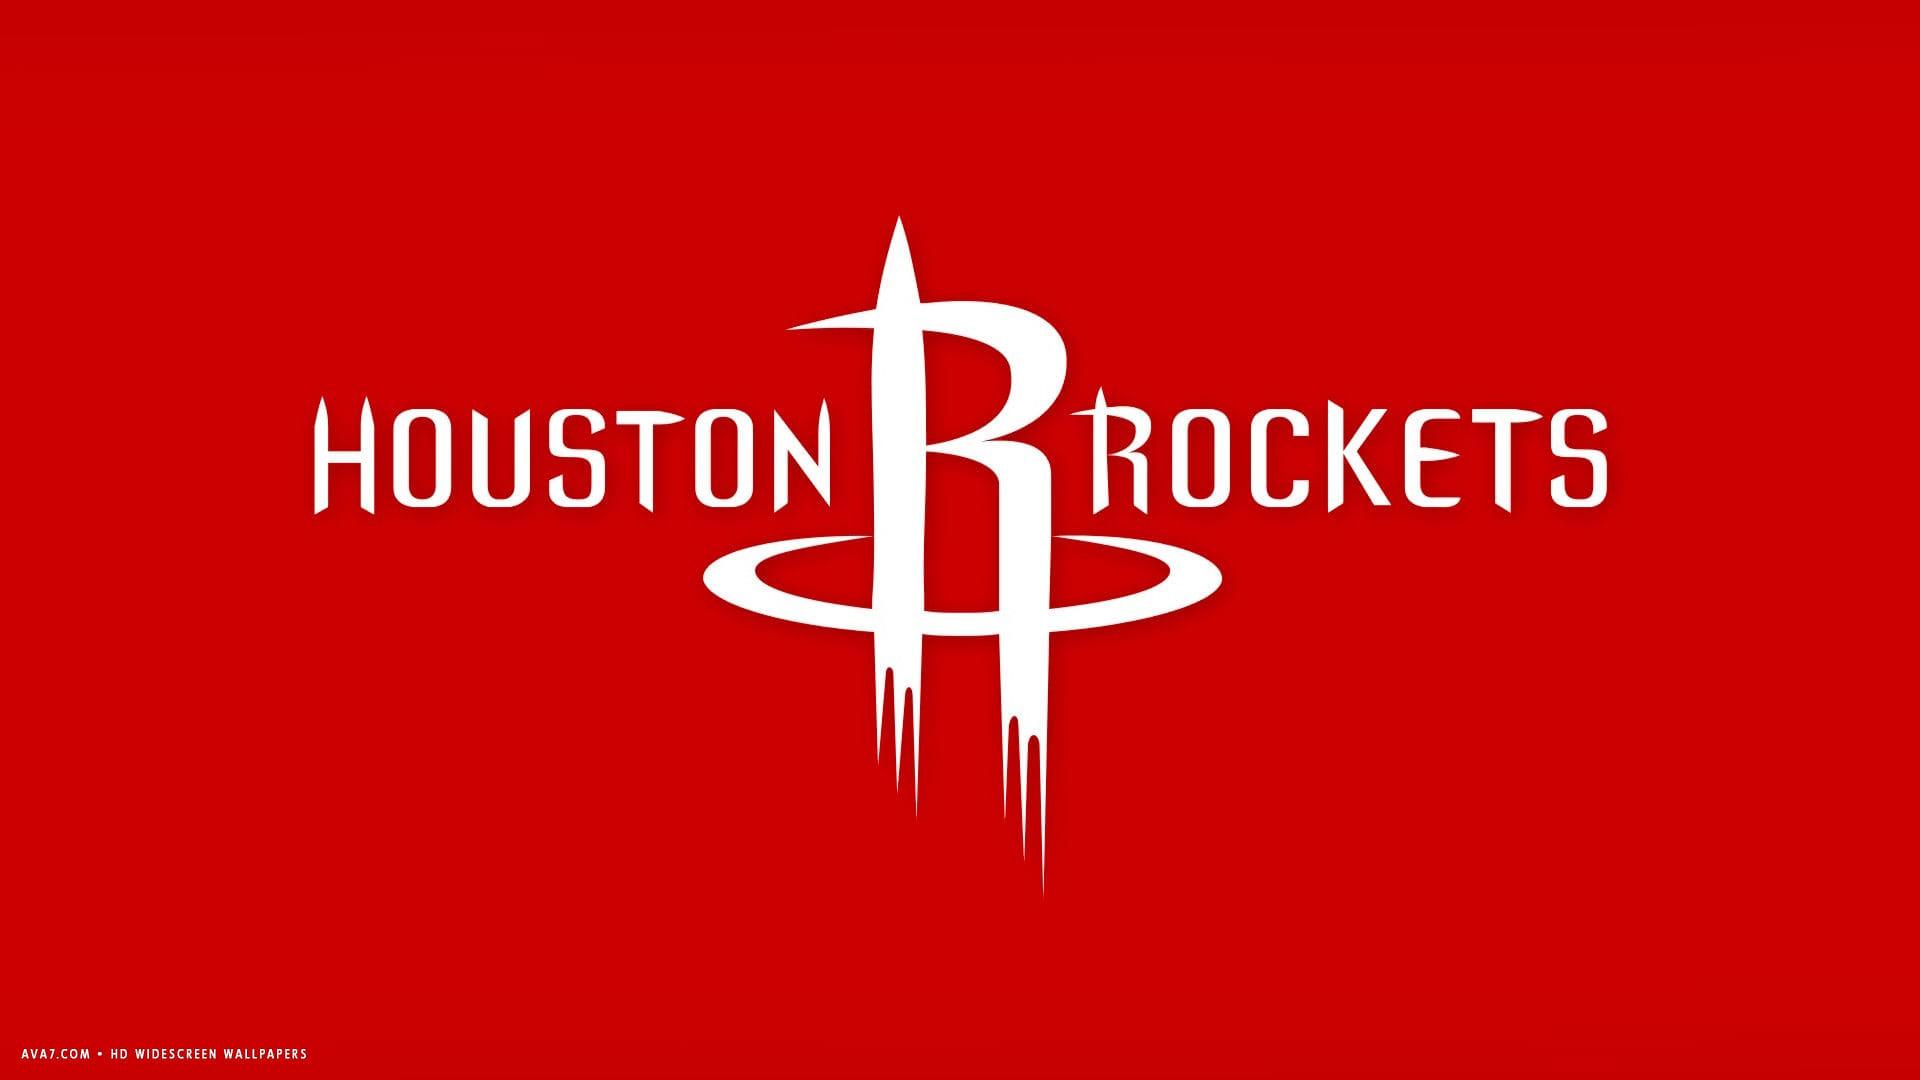 Modnyj rejting klubnyh emblem NBA 17. Houston Rockets